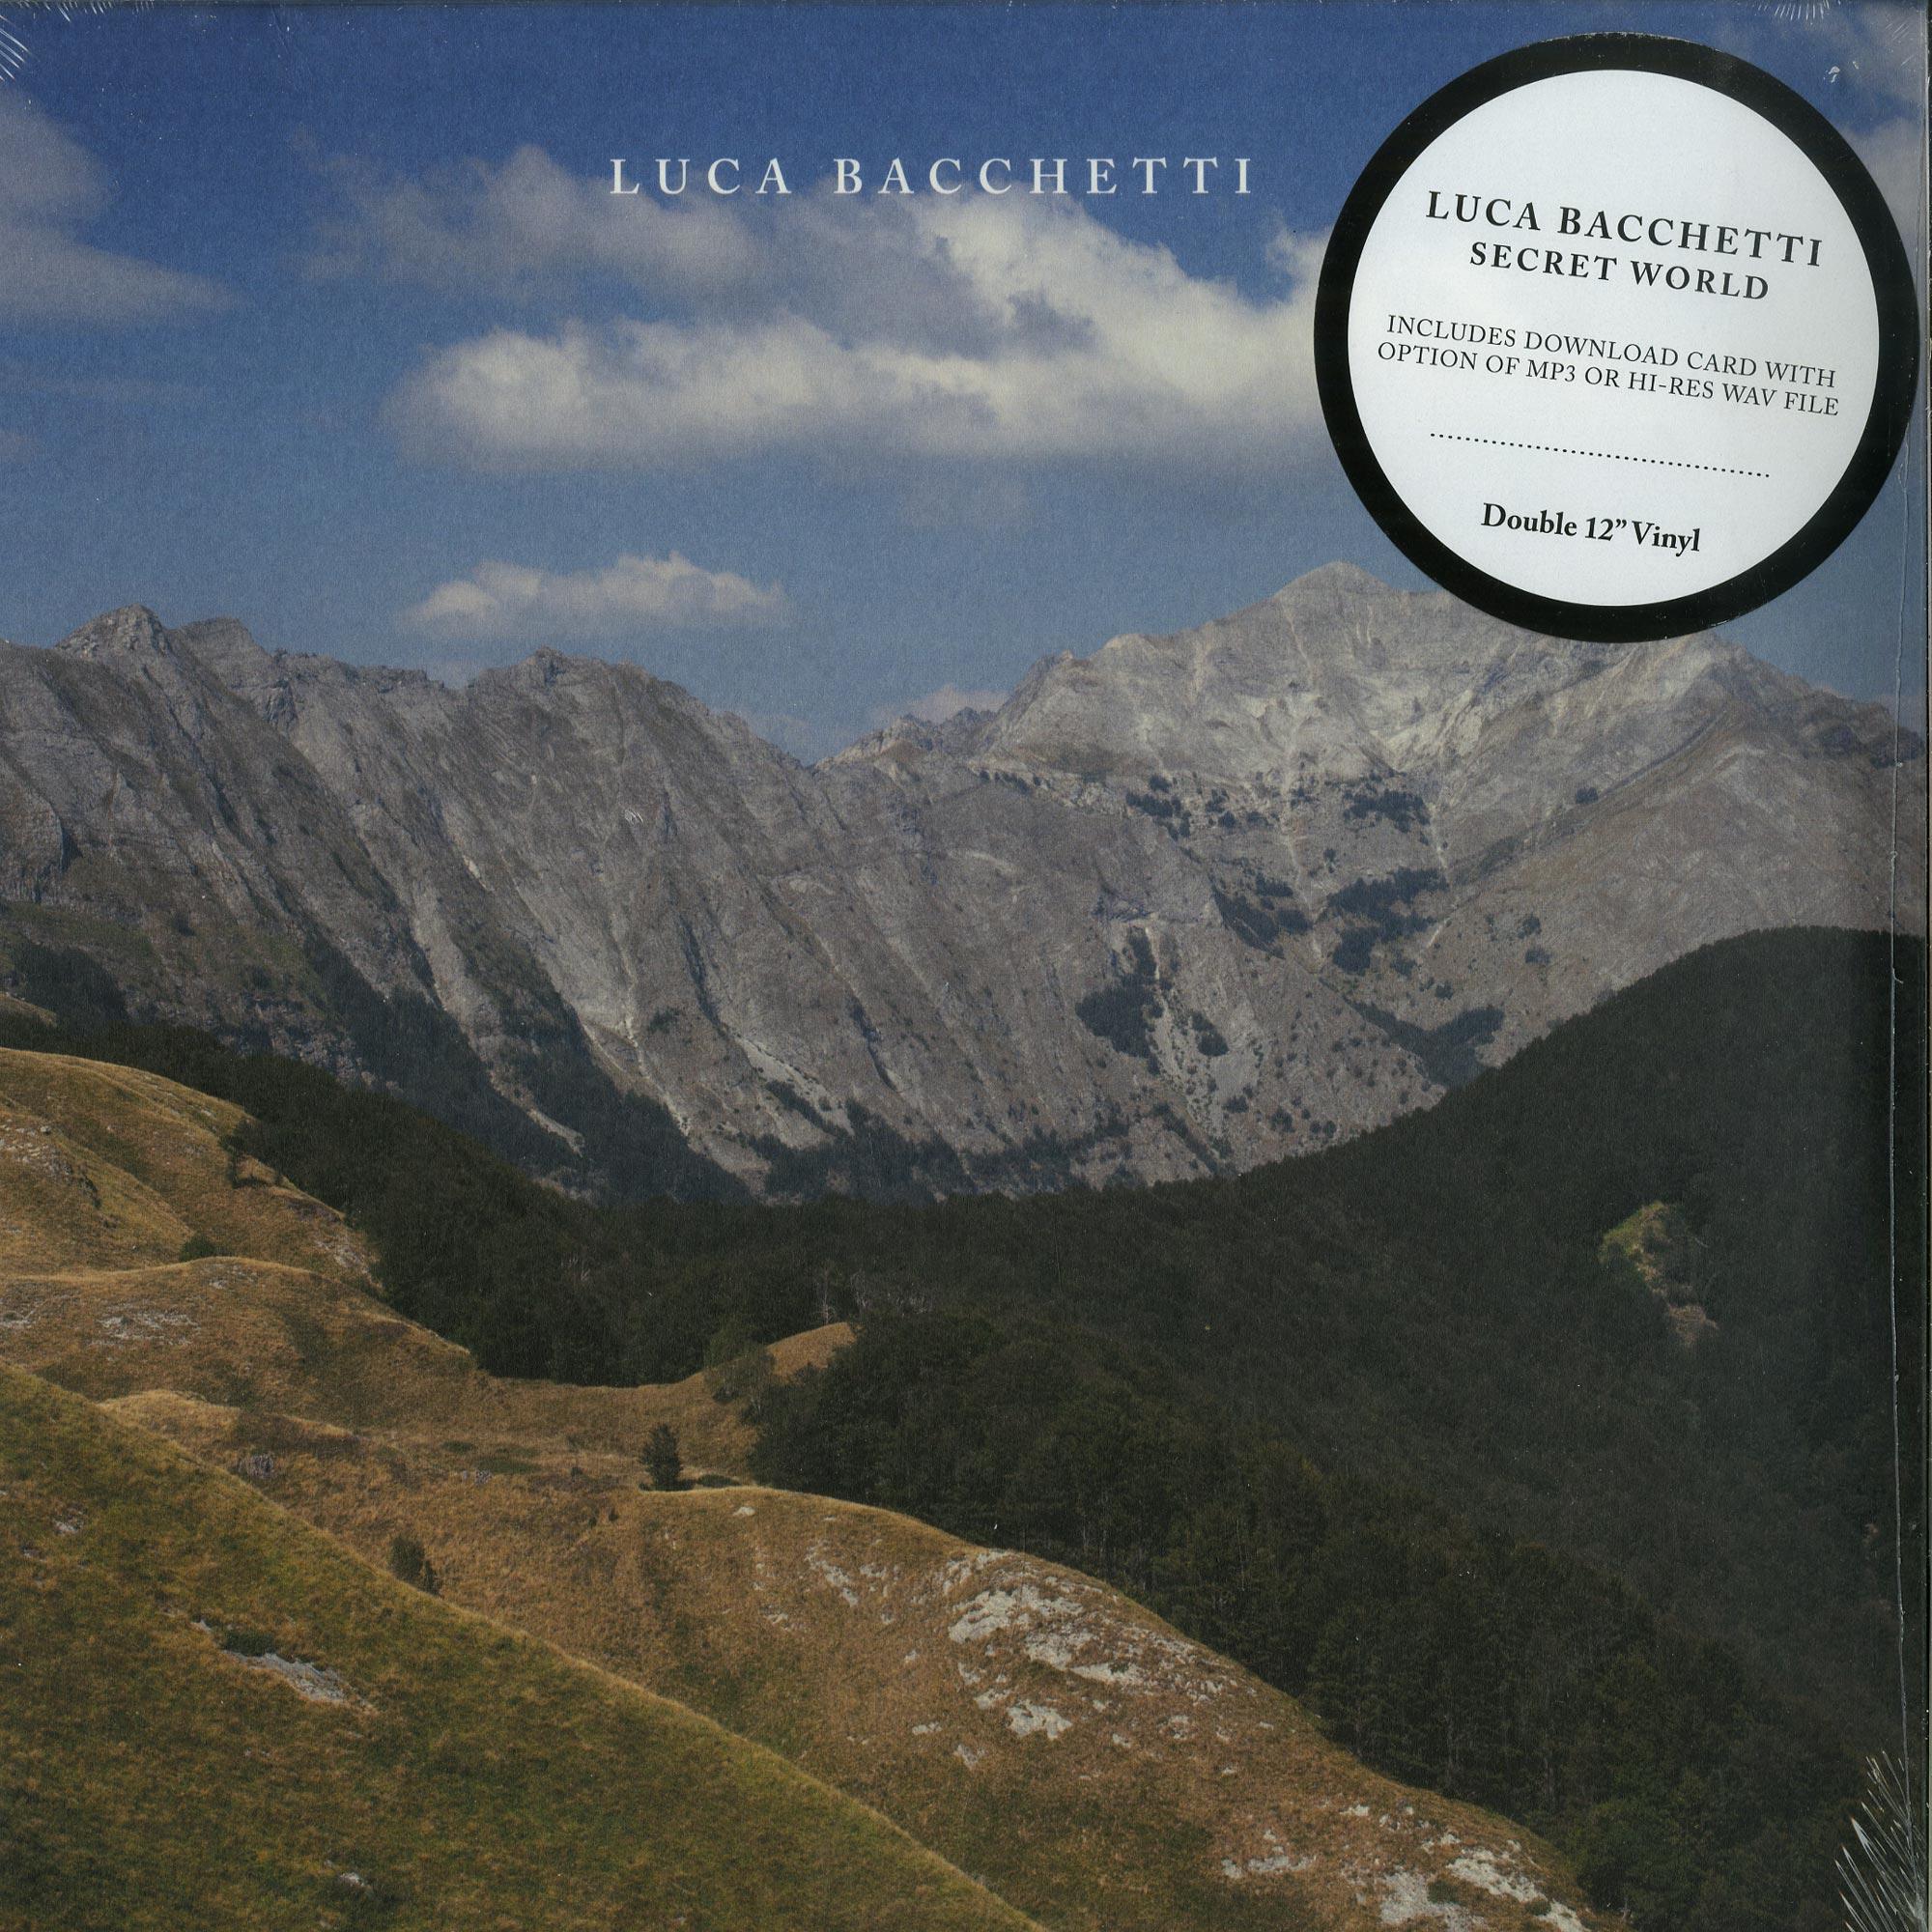 Luca Bacchetti - SECRET WORLD